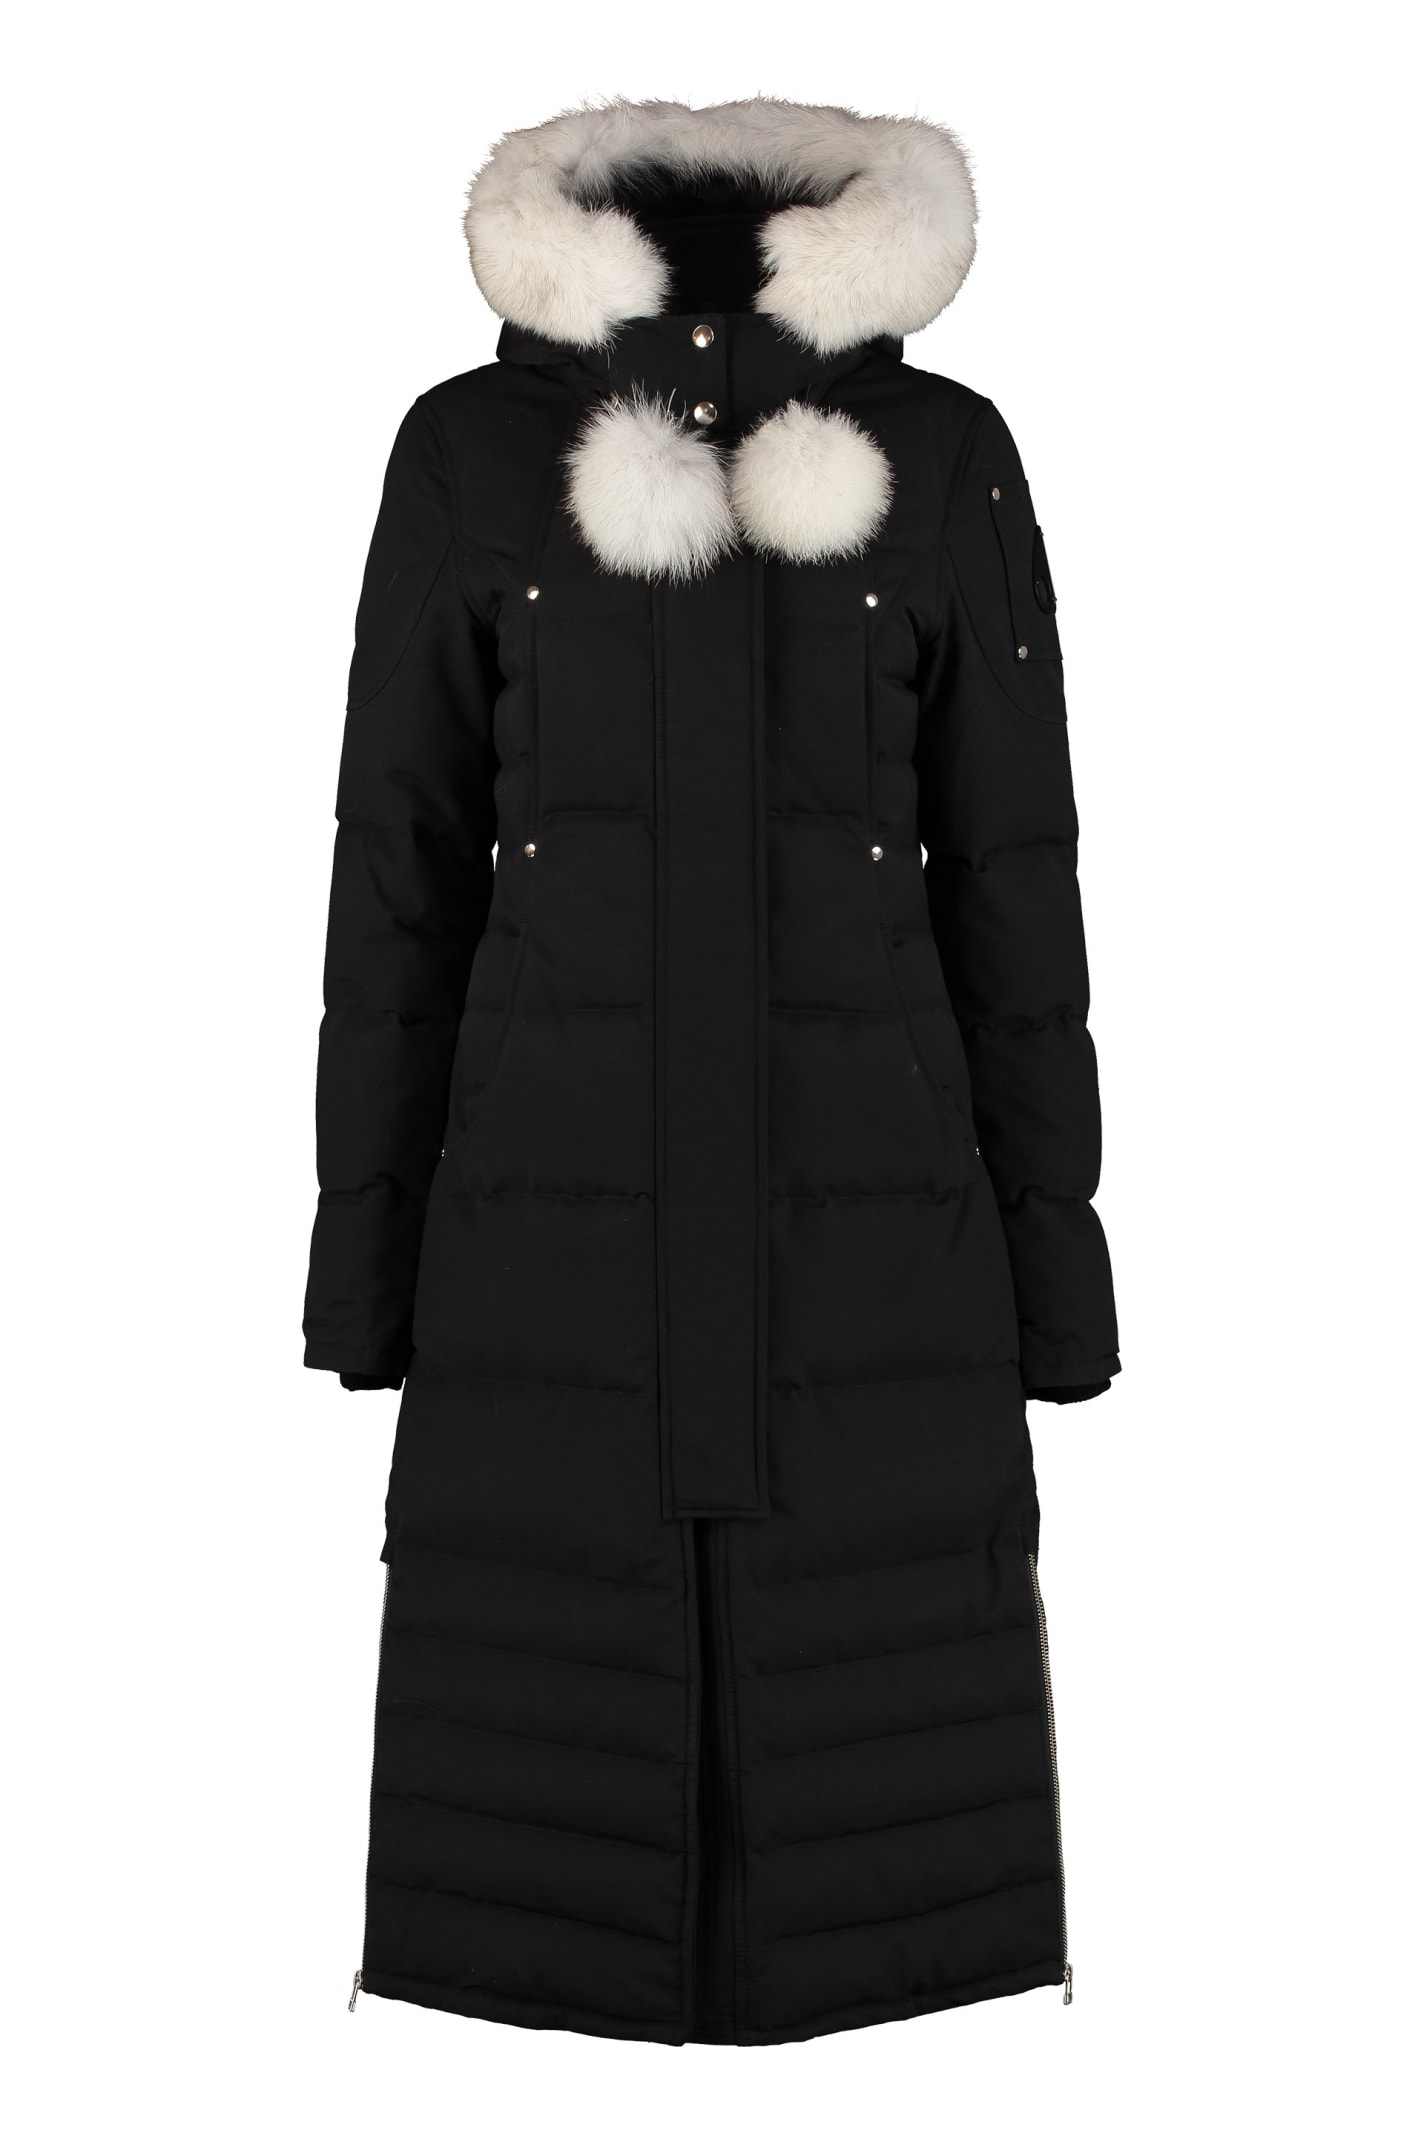 Moose Knuckles Saskatchewan Padded Parka With Fur Hood